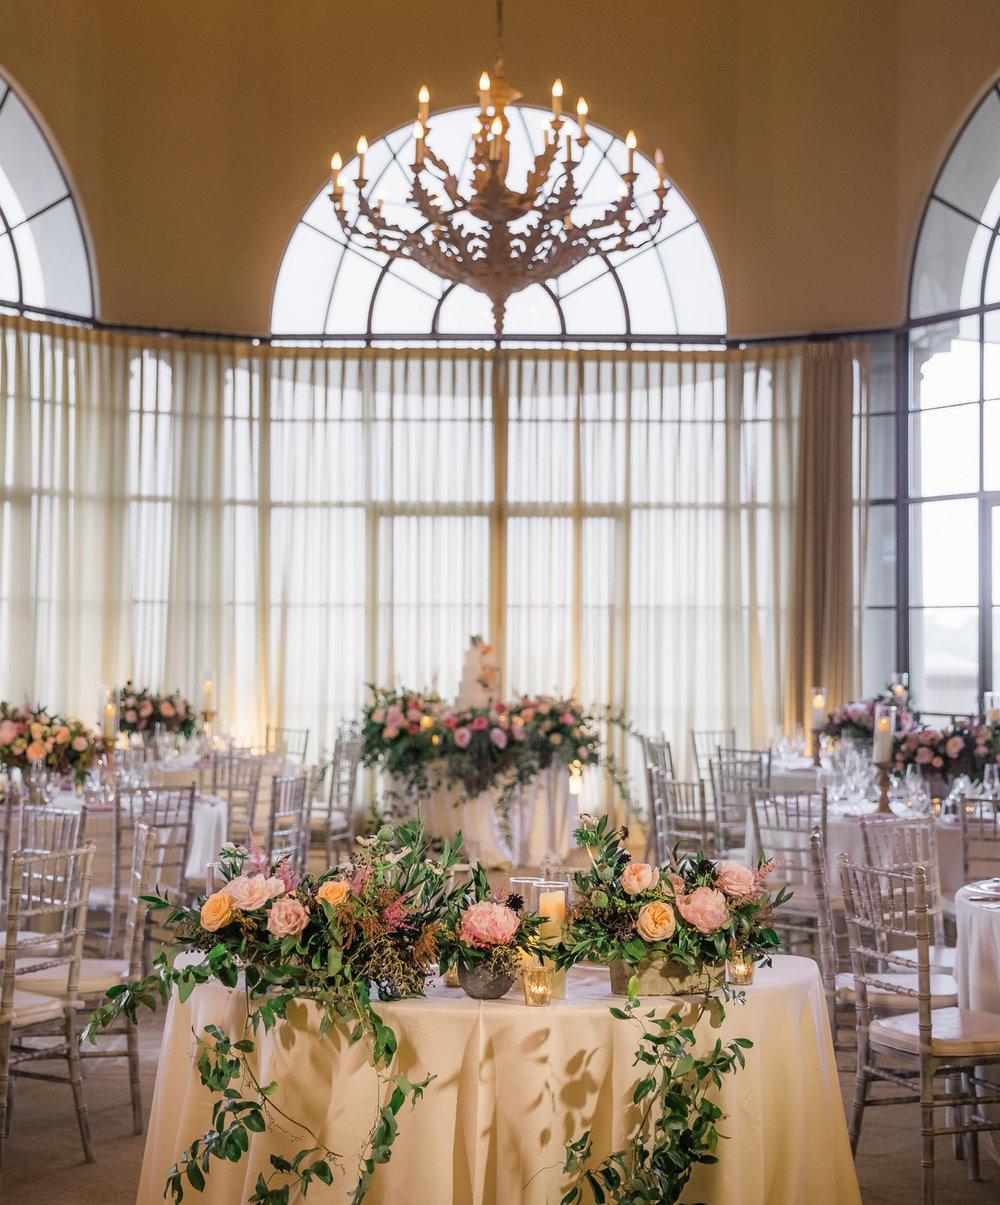 Real-Wedding-Pelican-Hill-Shawna-Yamamoto-LinandJirsa-Photography_1677.jpg